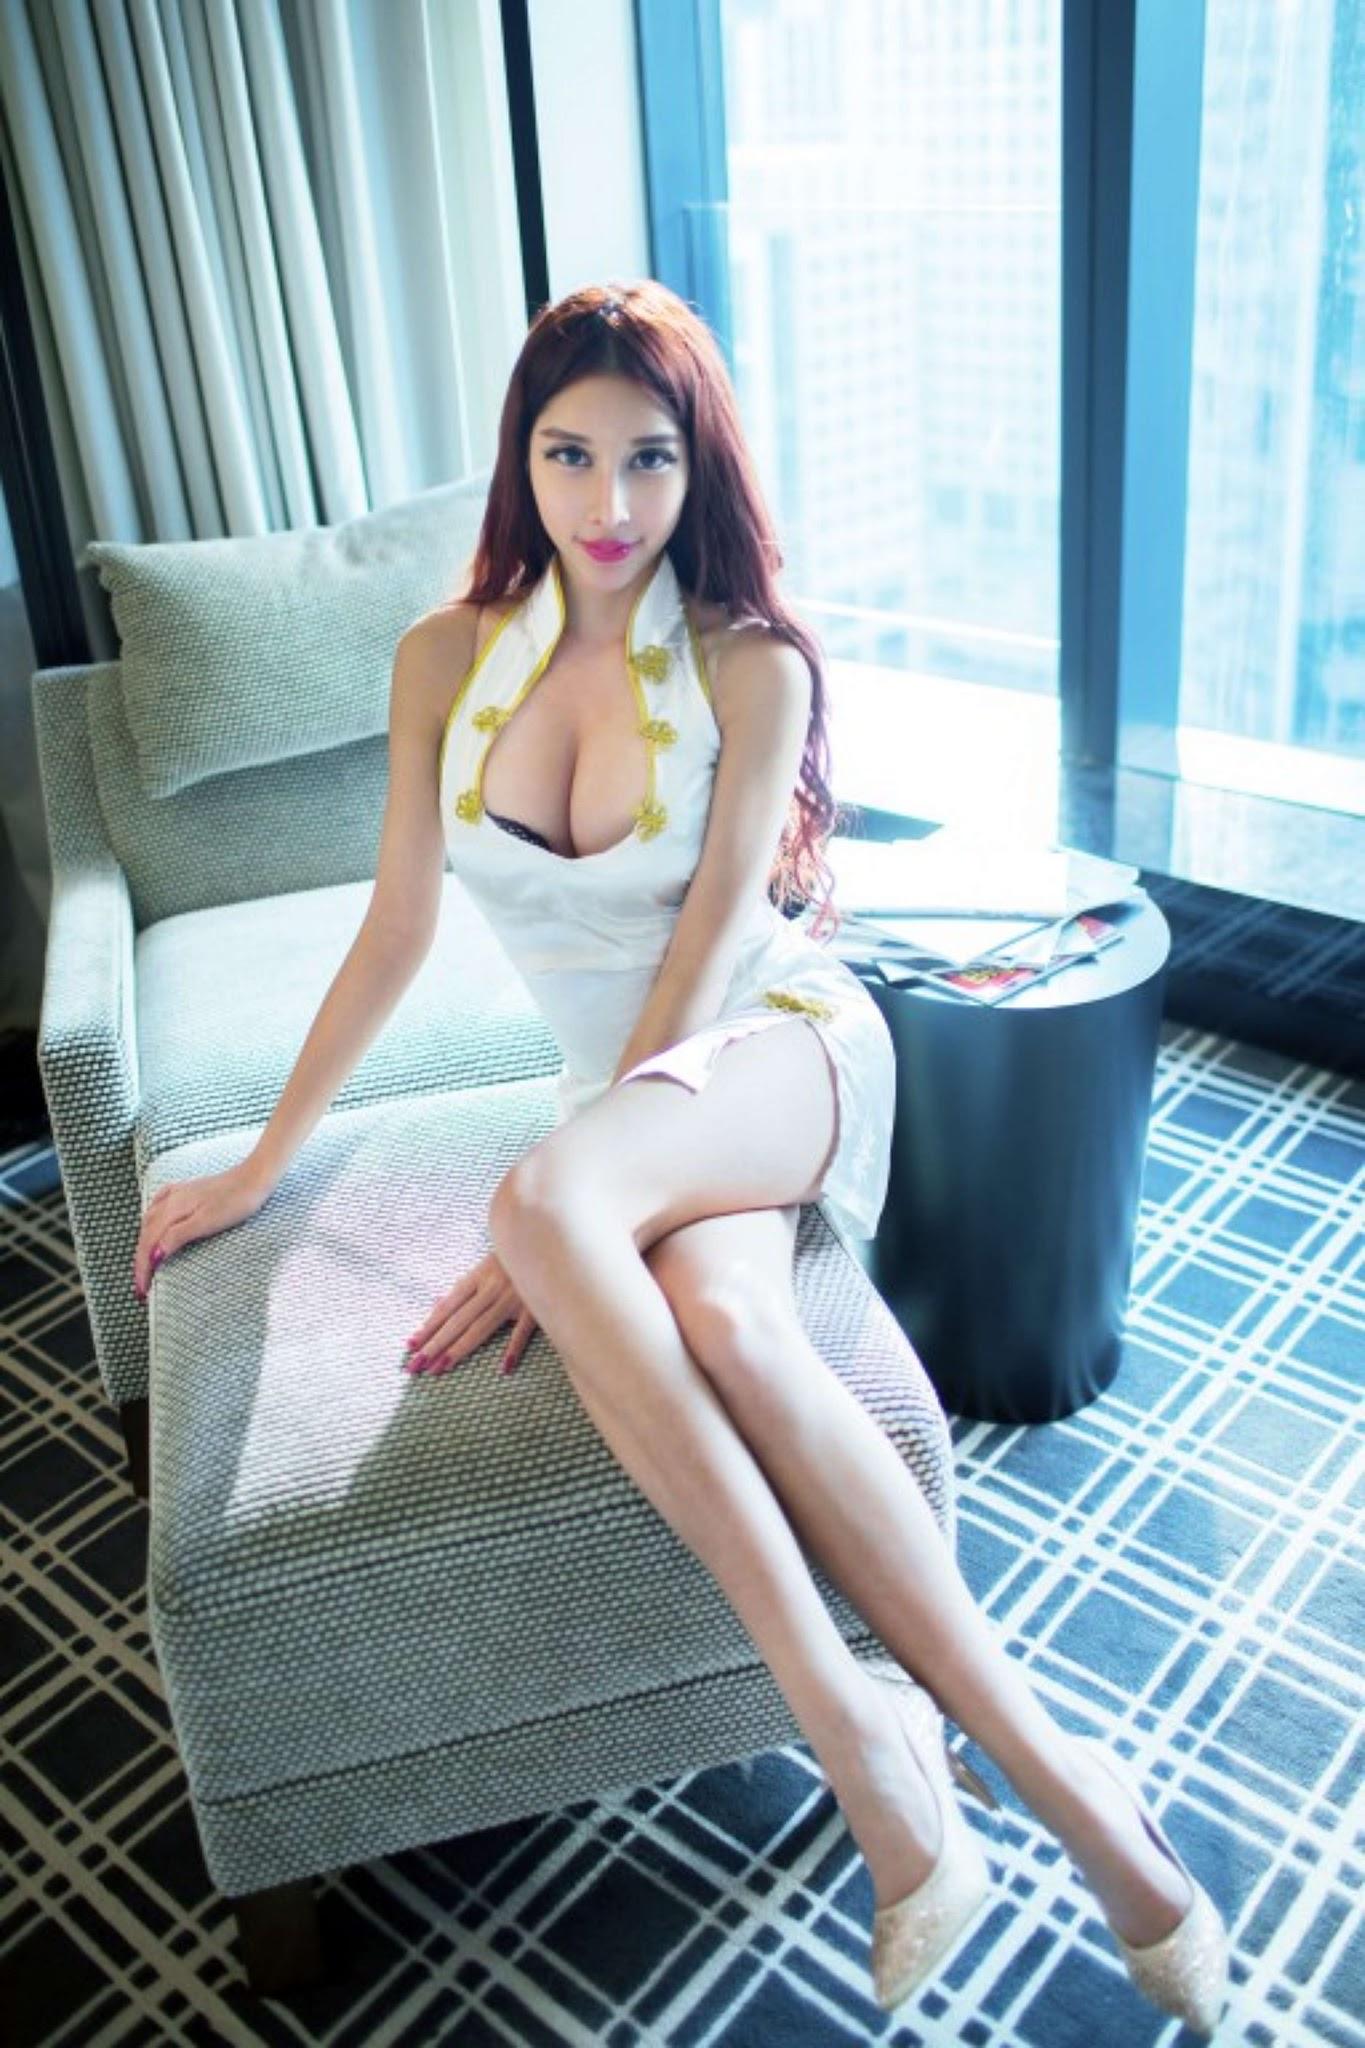 ATK model Asia Zo